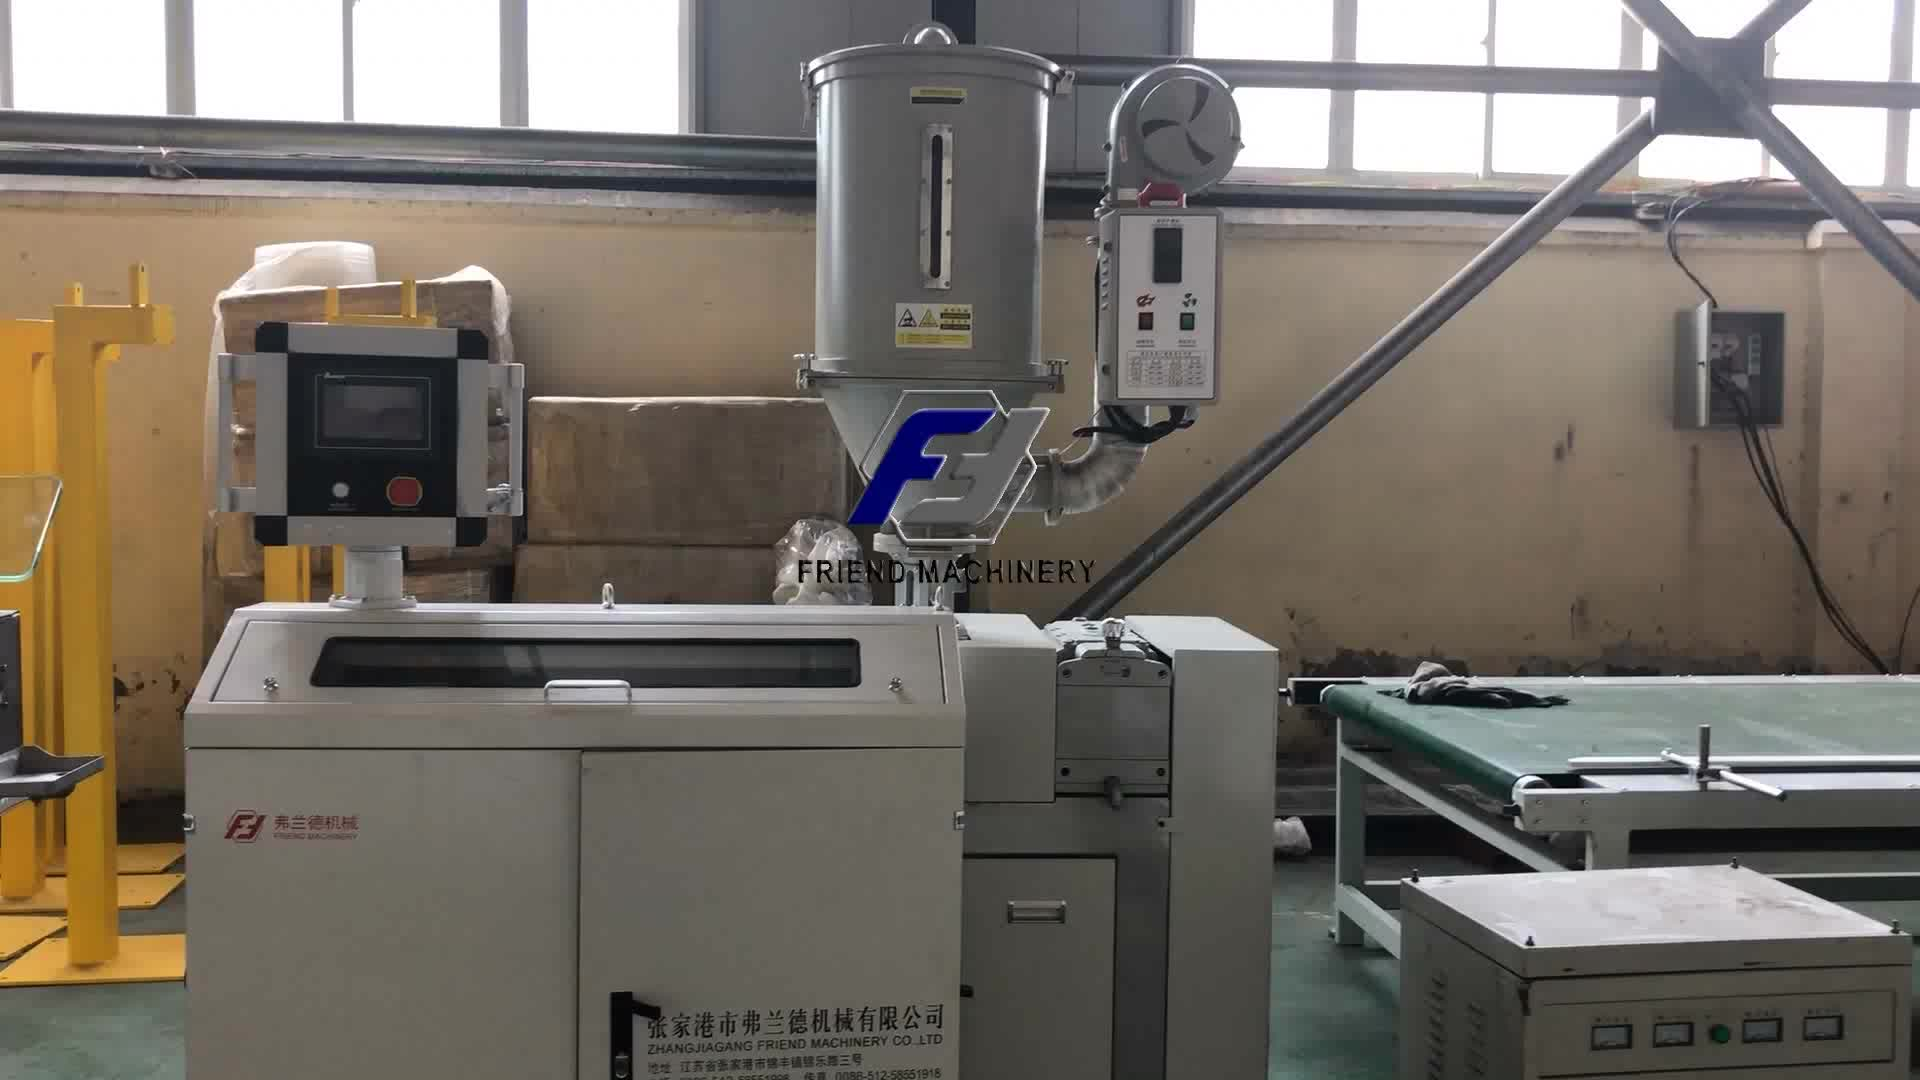 1.75mm PVA PEI PEEK PC PA filament extruder 3D printer filament making machine Vriend Machines